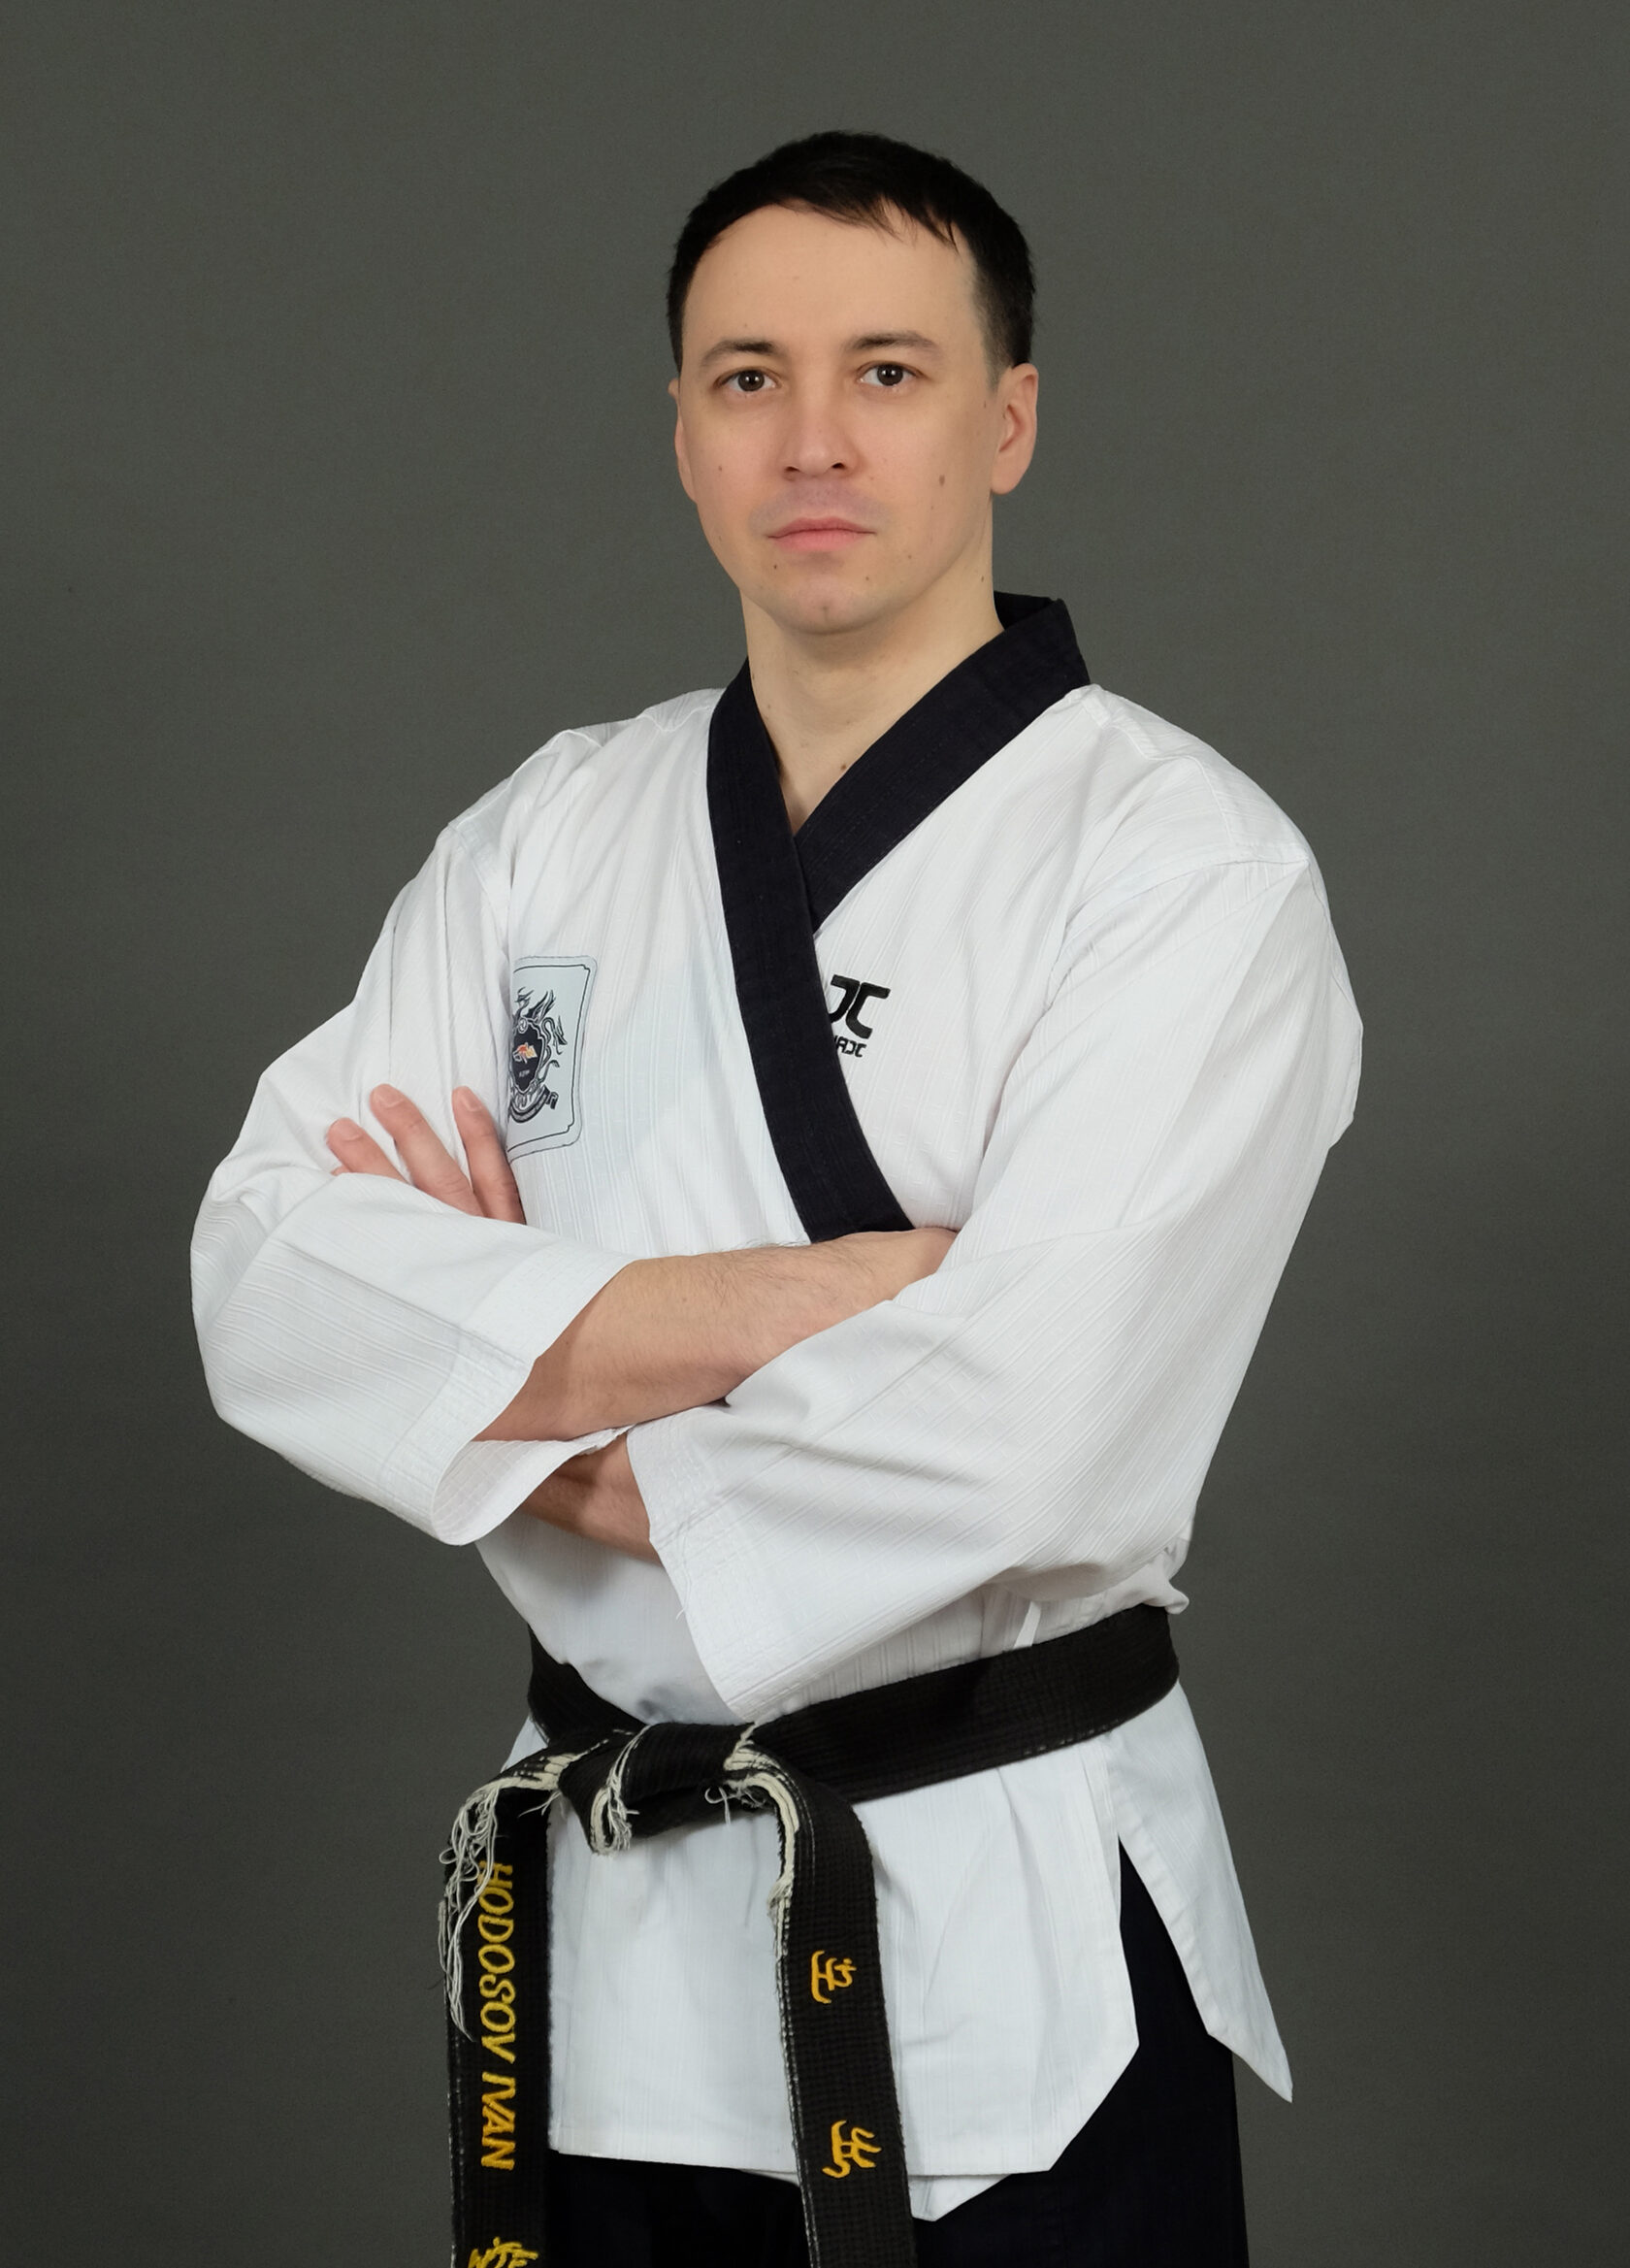 Ходосов Иван Иванович